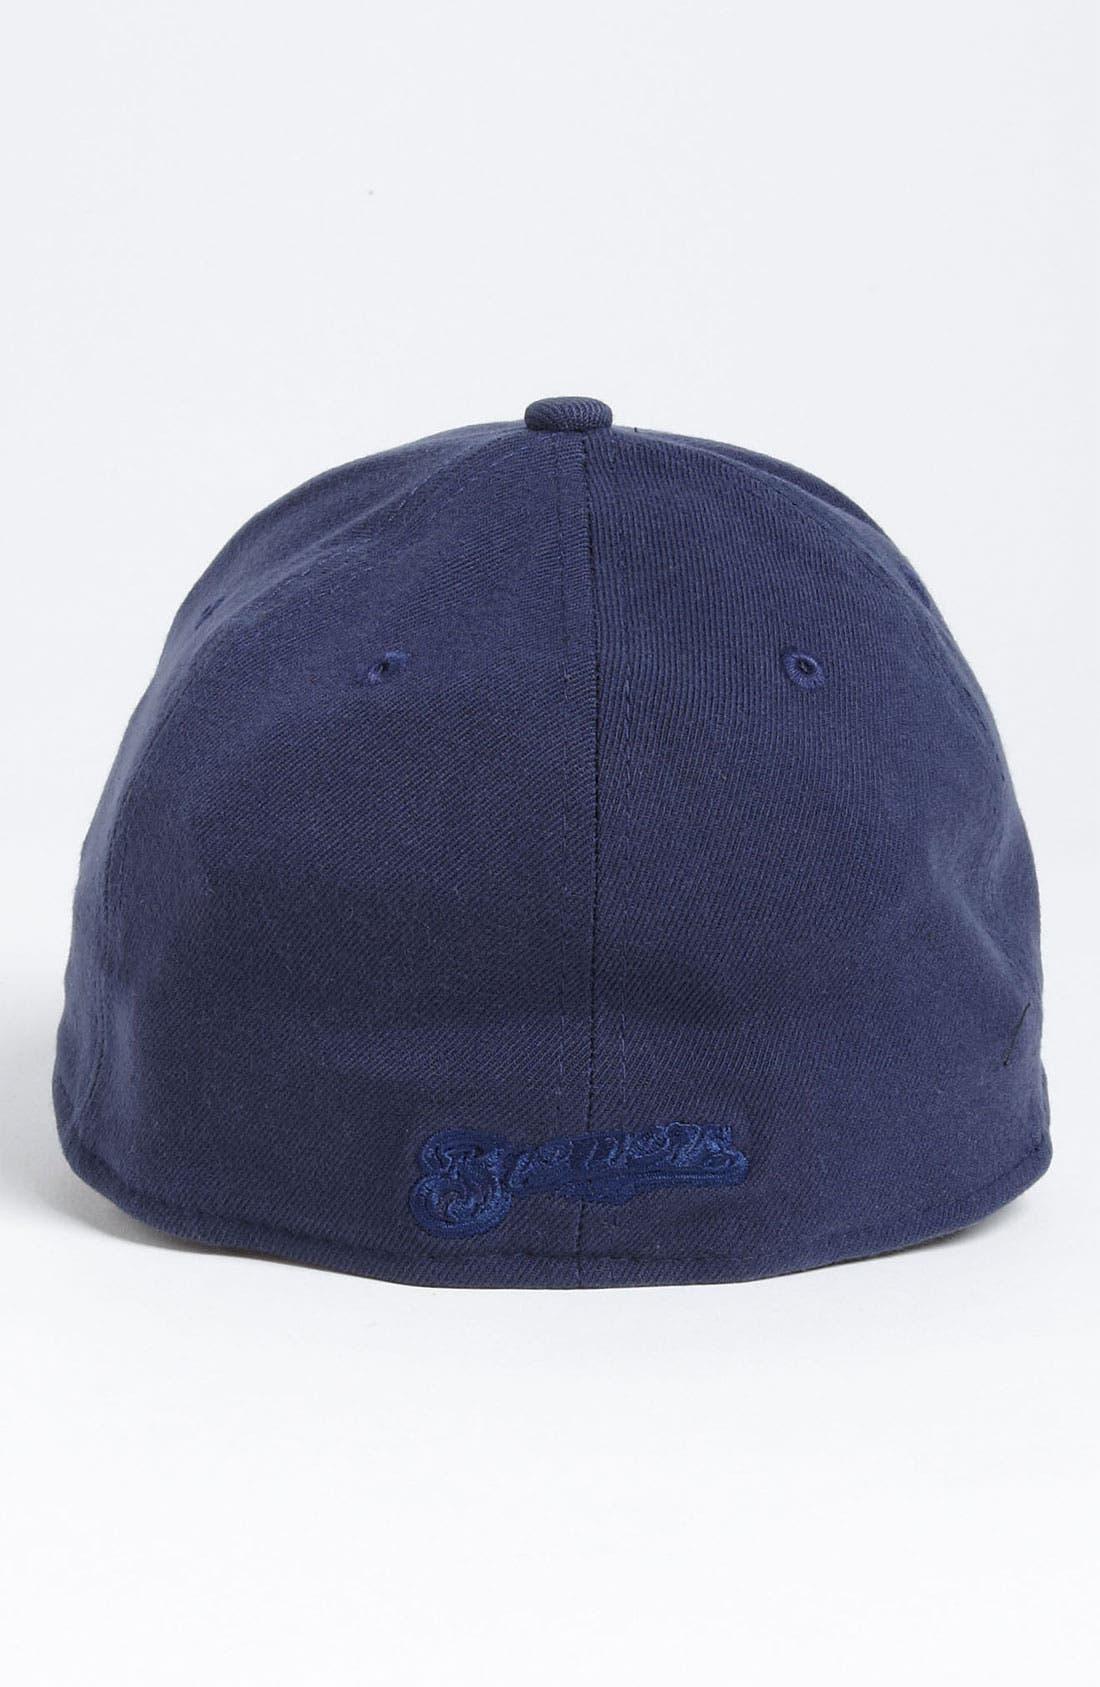 Alternate Image 2  - New Era Cap 'Tonal Classic - Milwaukee Brewers' Fitted Baseball Cap